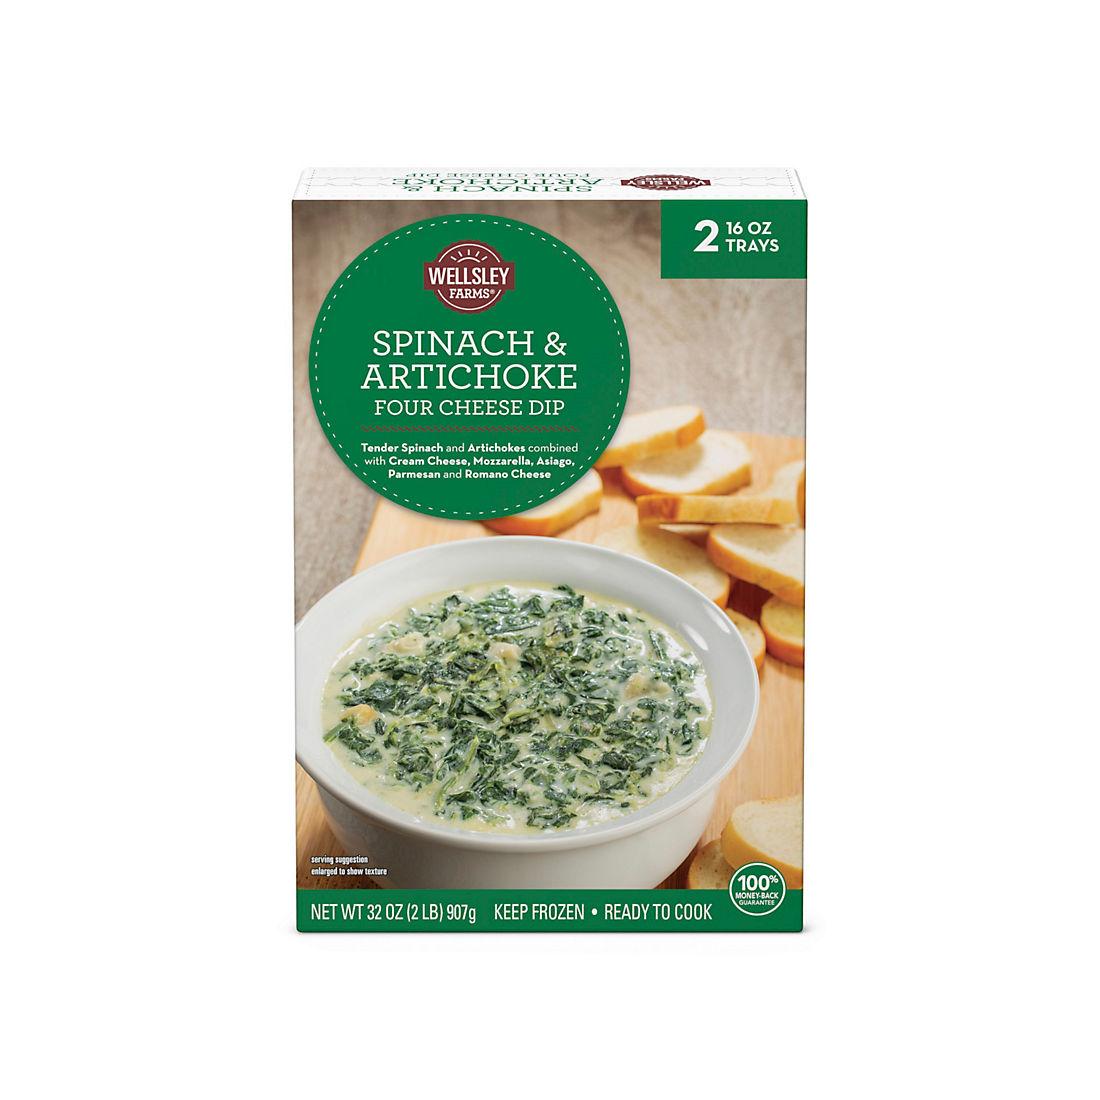 Wellsley Farms Spinach And Artichoke Four Cheese Dip Bjs Wholesale Club